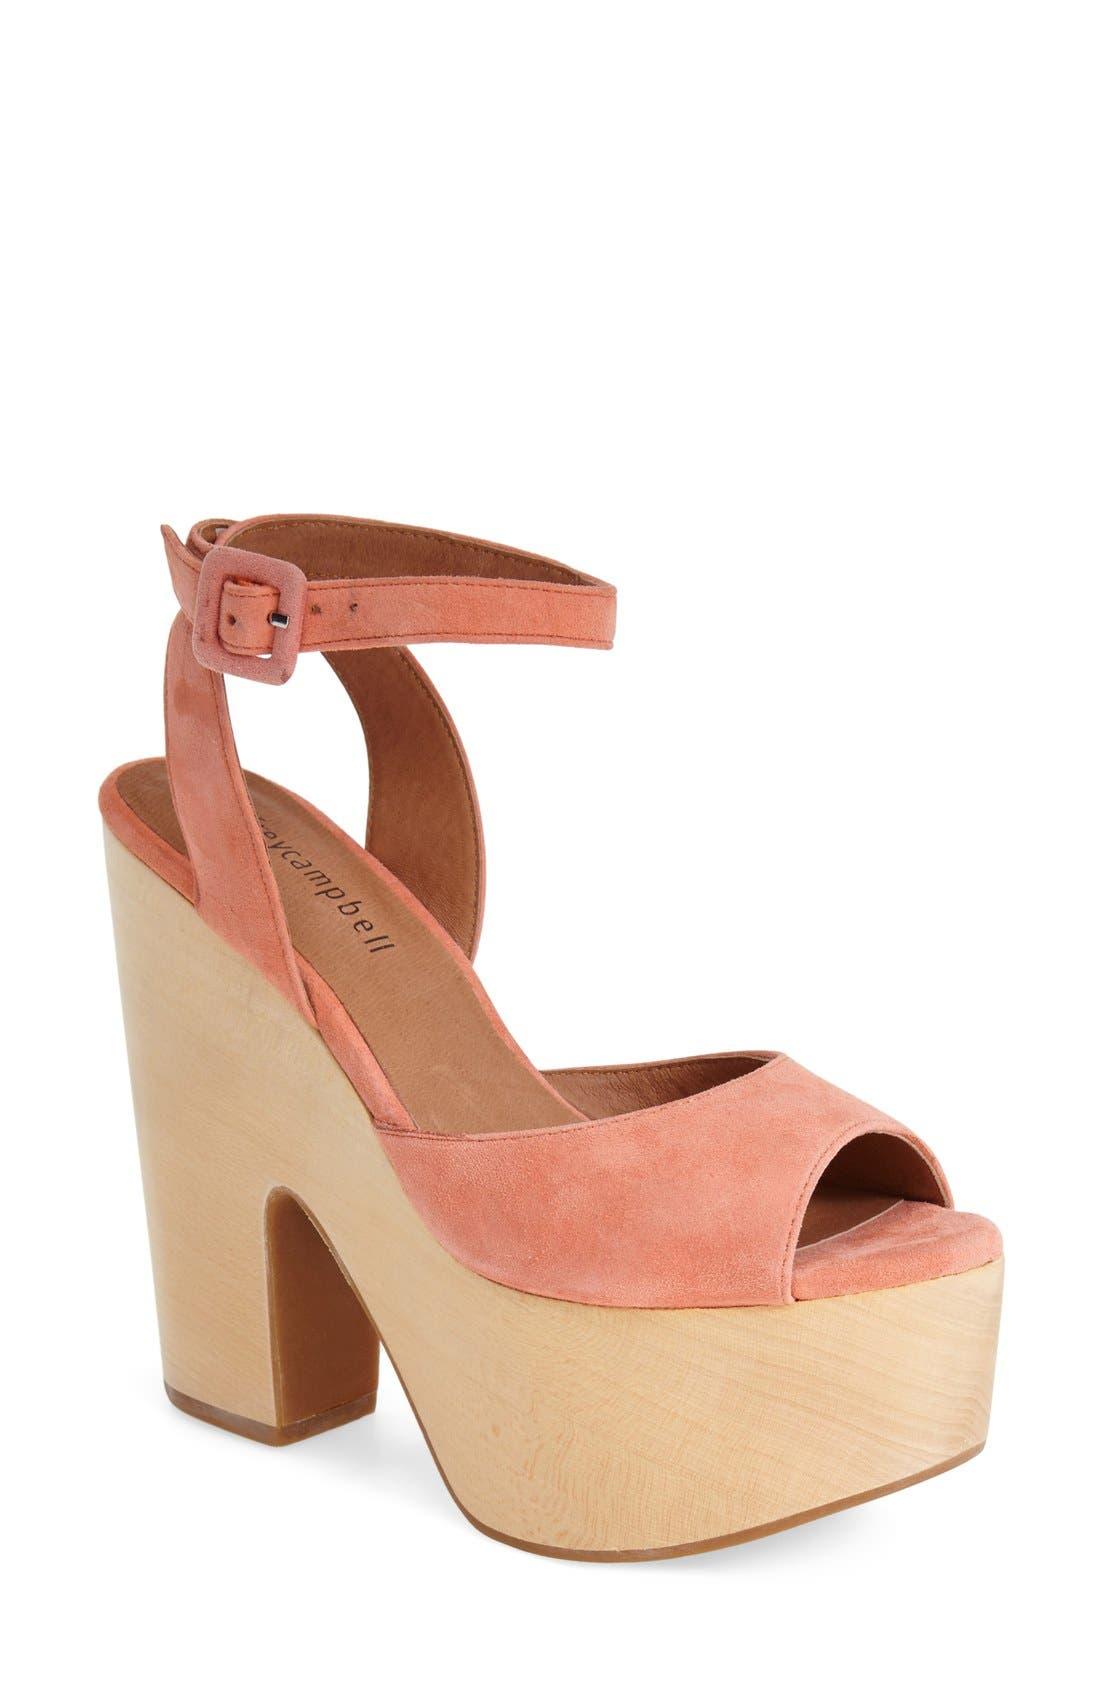 Alternate Image 1 Selected - Jeffrey Campbell 'Sassy' Wood Platform Sandal (Women)